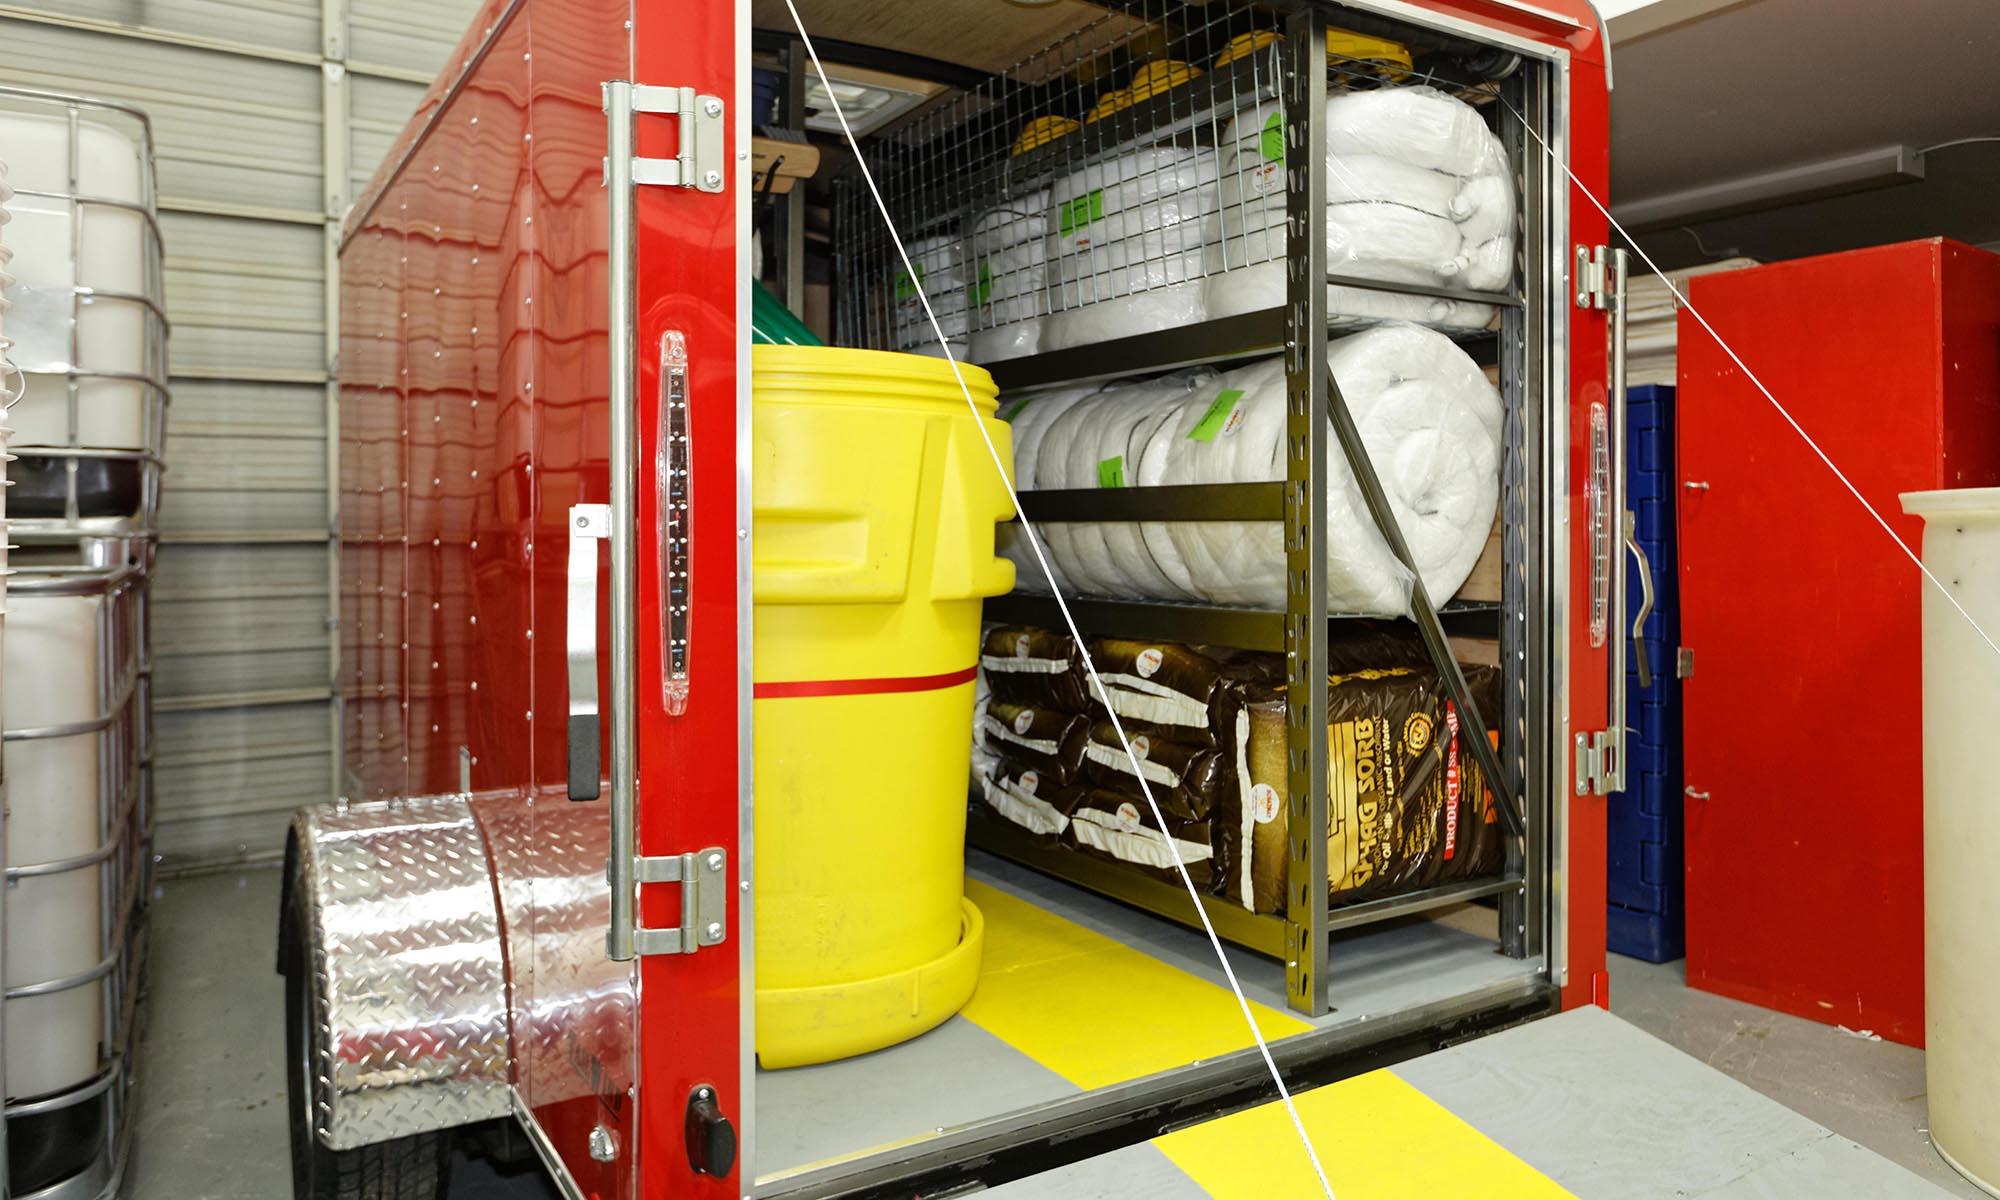 environmental protection & spill response trailers, Environmental Protection & Spill Response Trailers, Spill Response Trailers..., Spill Response Trailers...